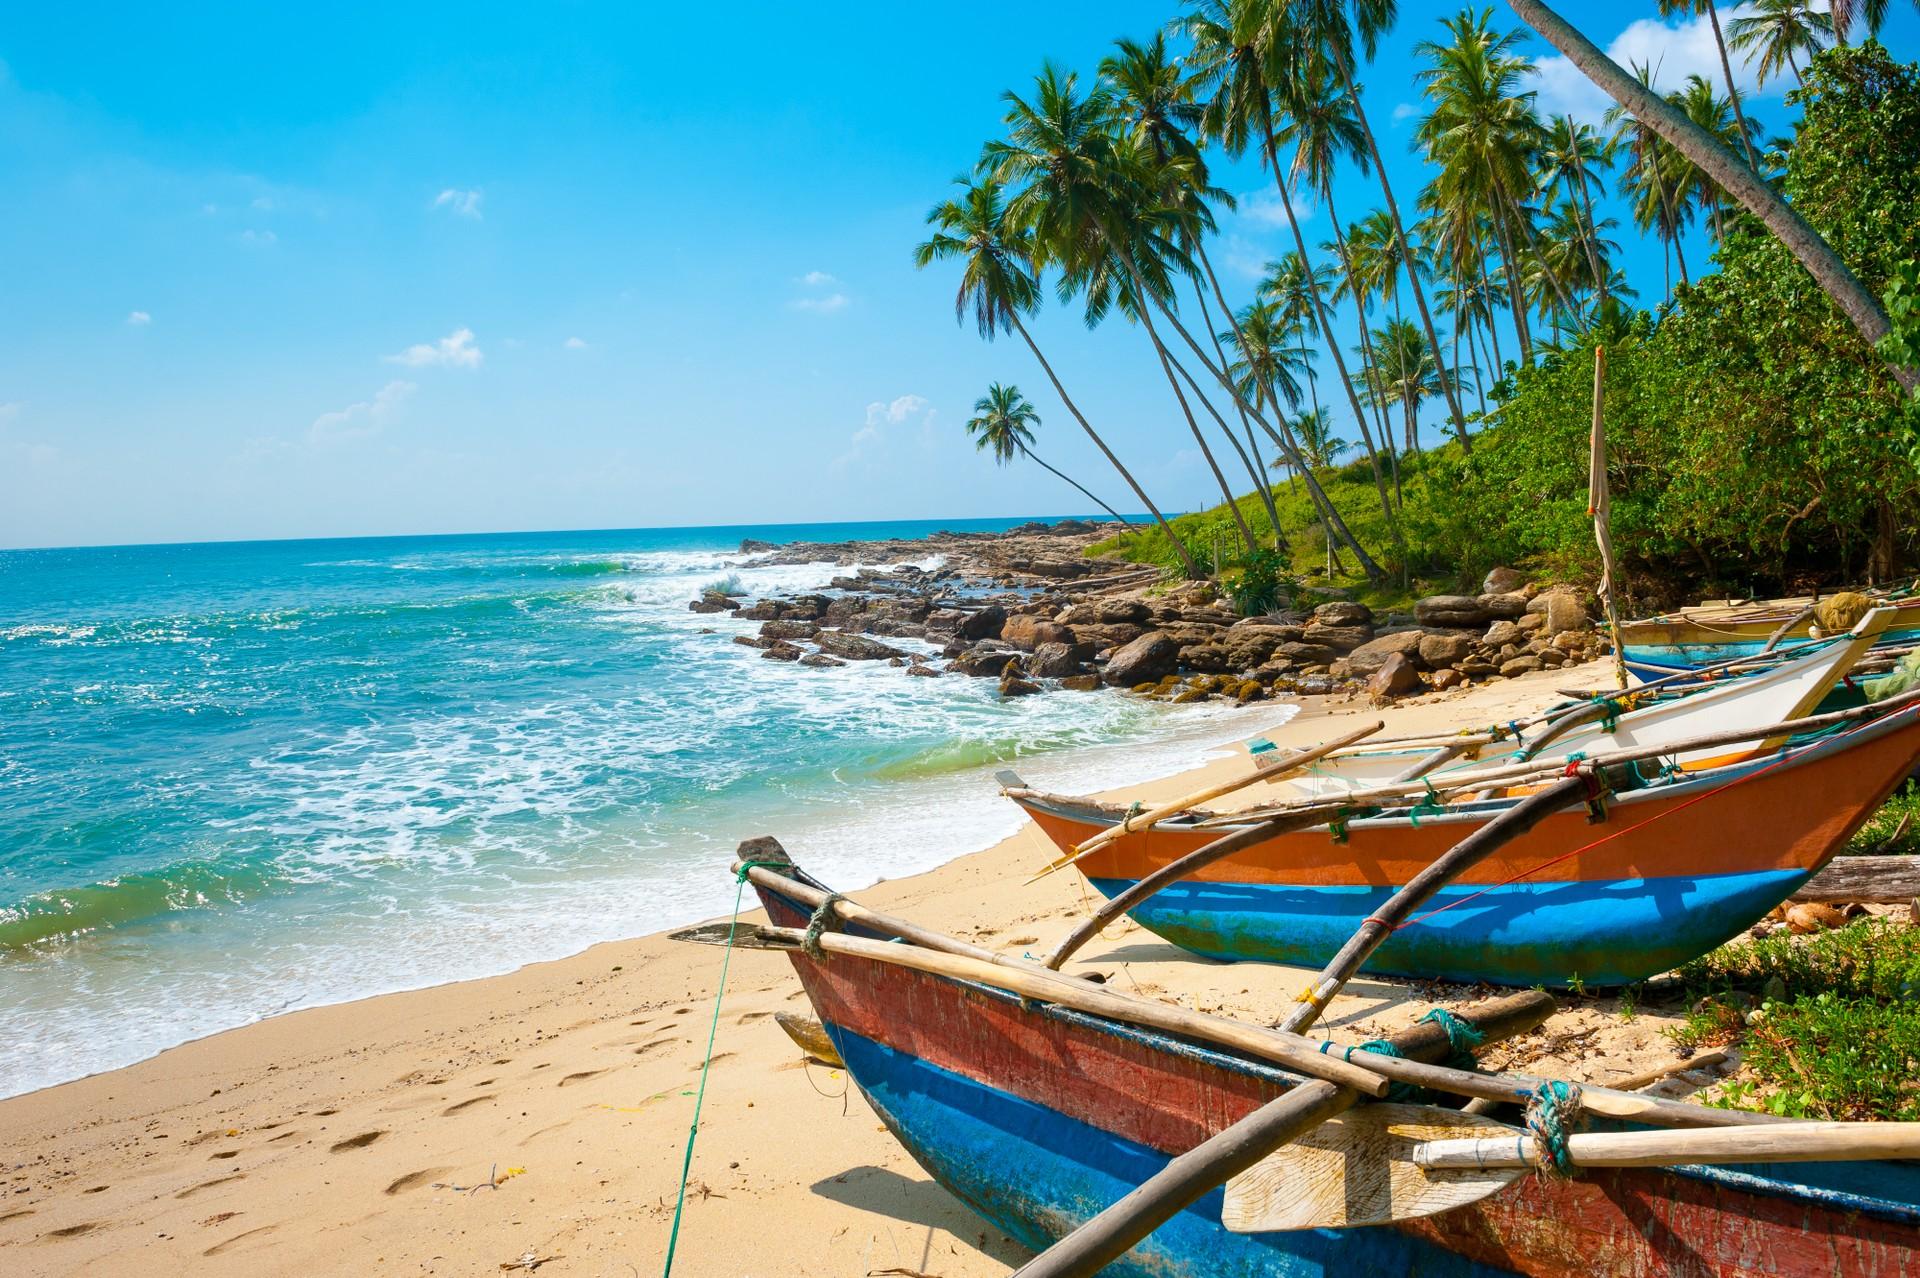 Sri Lanka holidays: Balapitiya beach